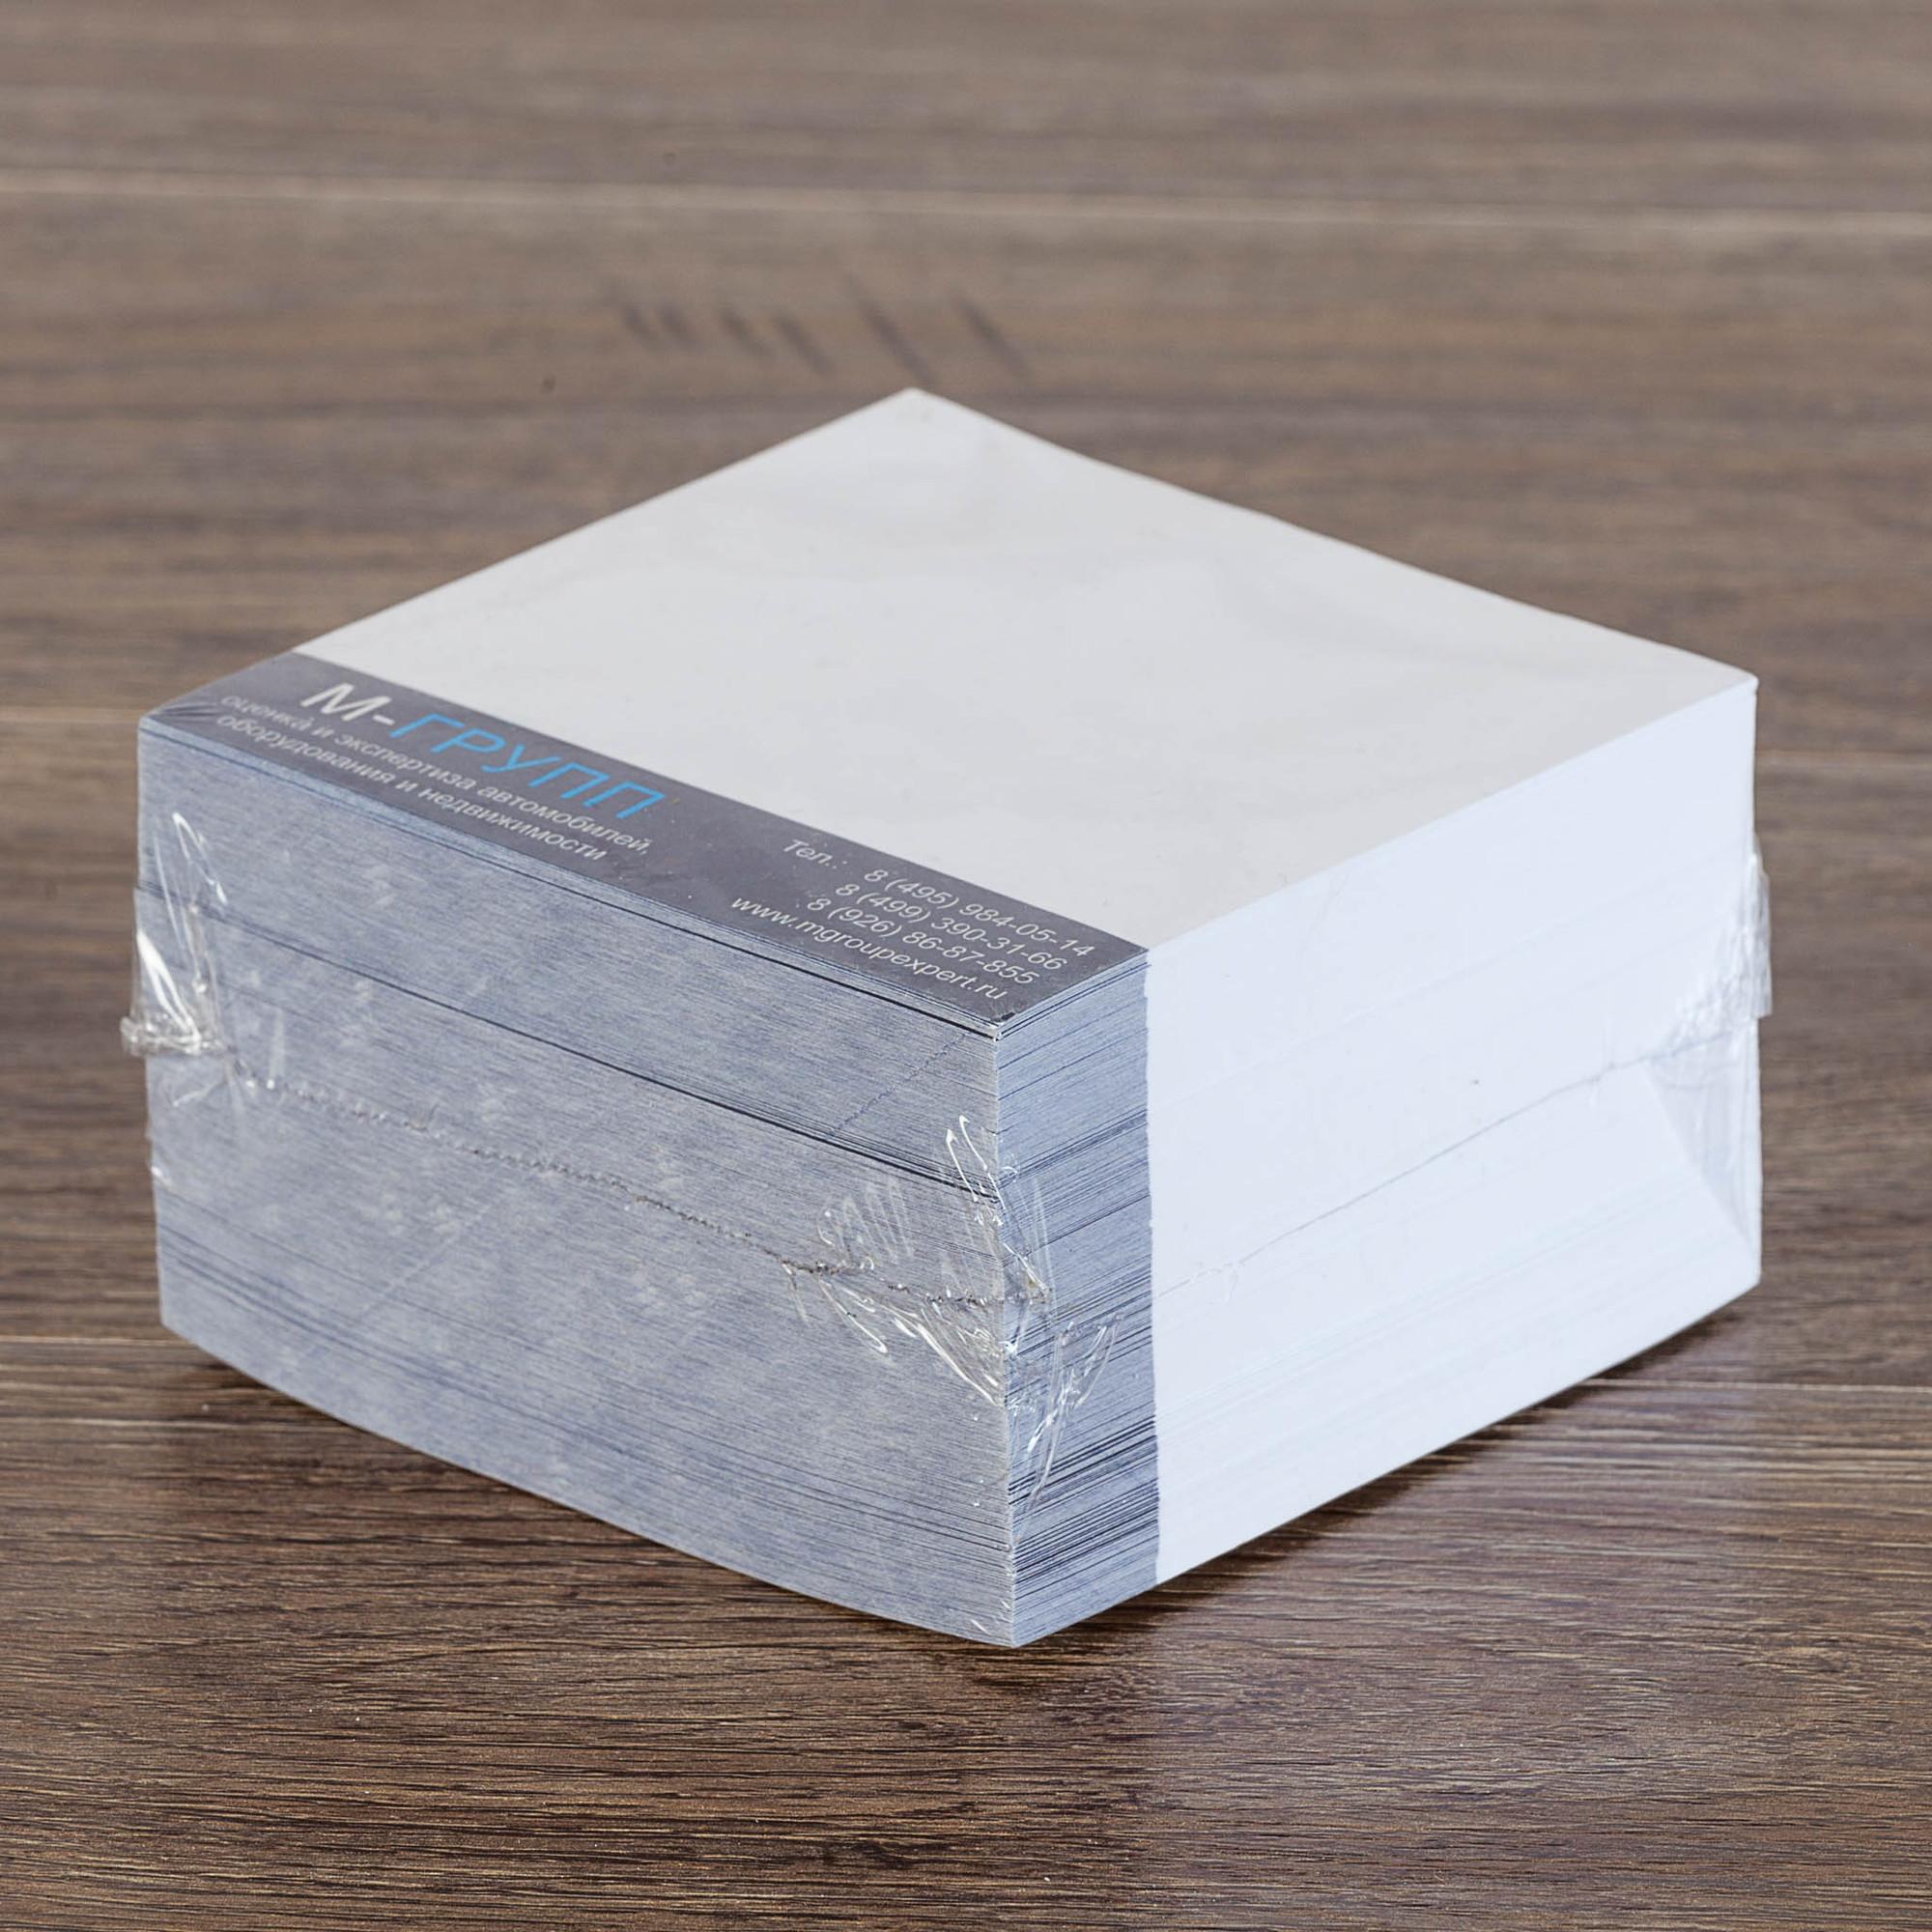 Блок кубарика 9х9х9 в термопленке